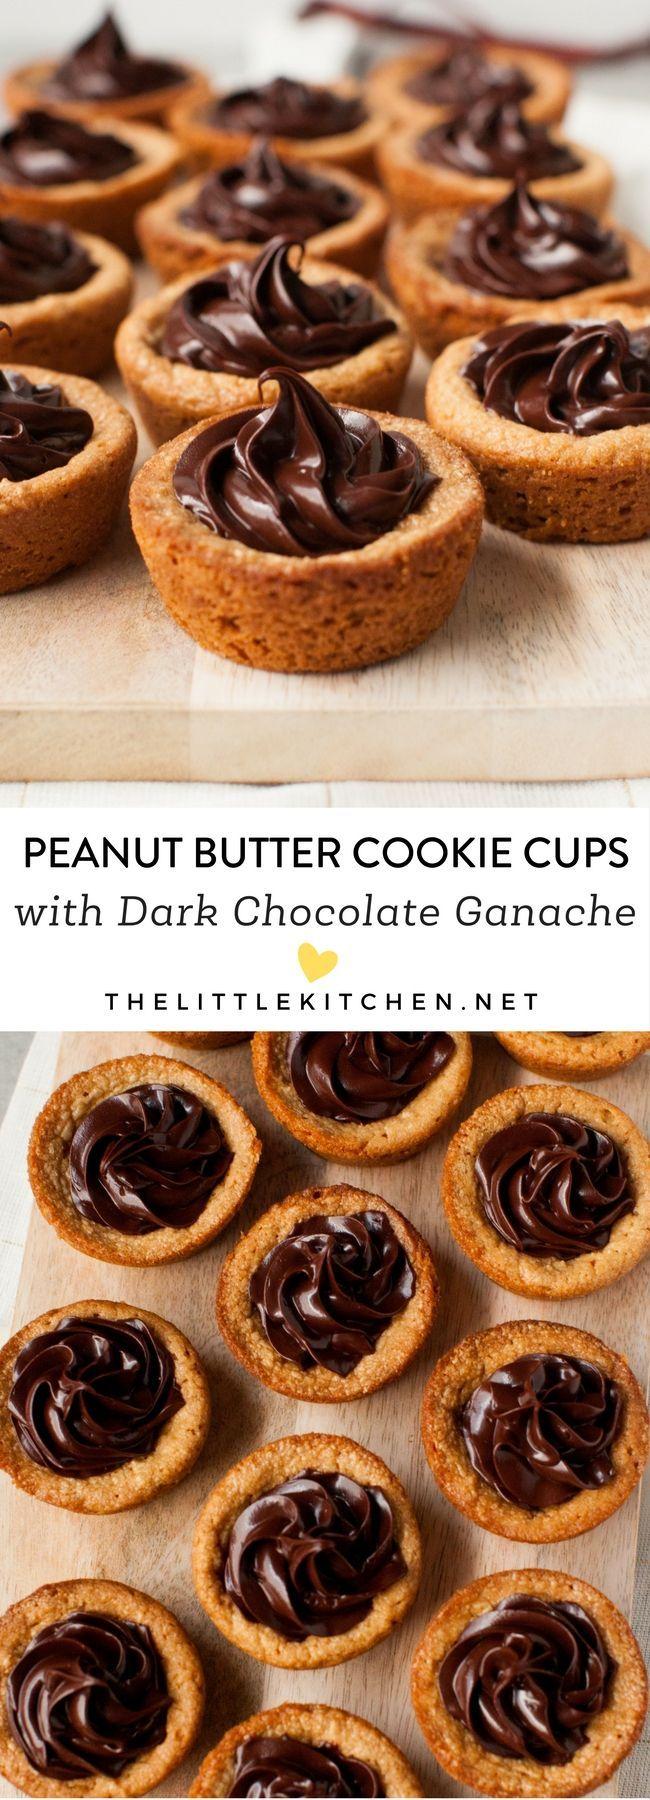 Peanut Butter Cookie Cups with Dark Chocolate Ganache from thelittlekitchen.net